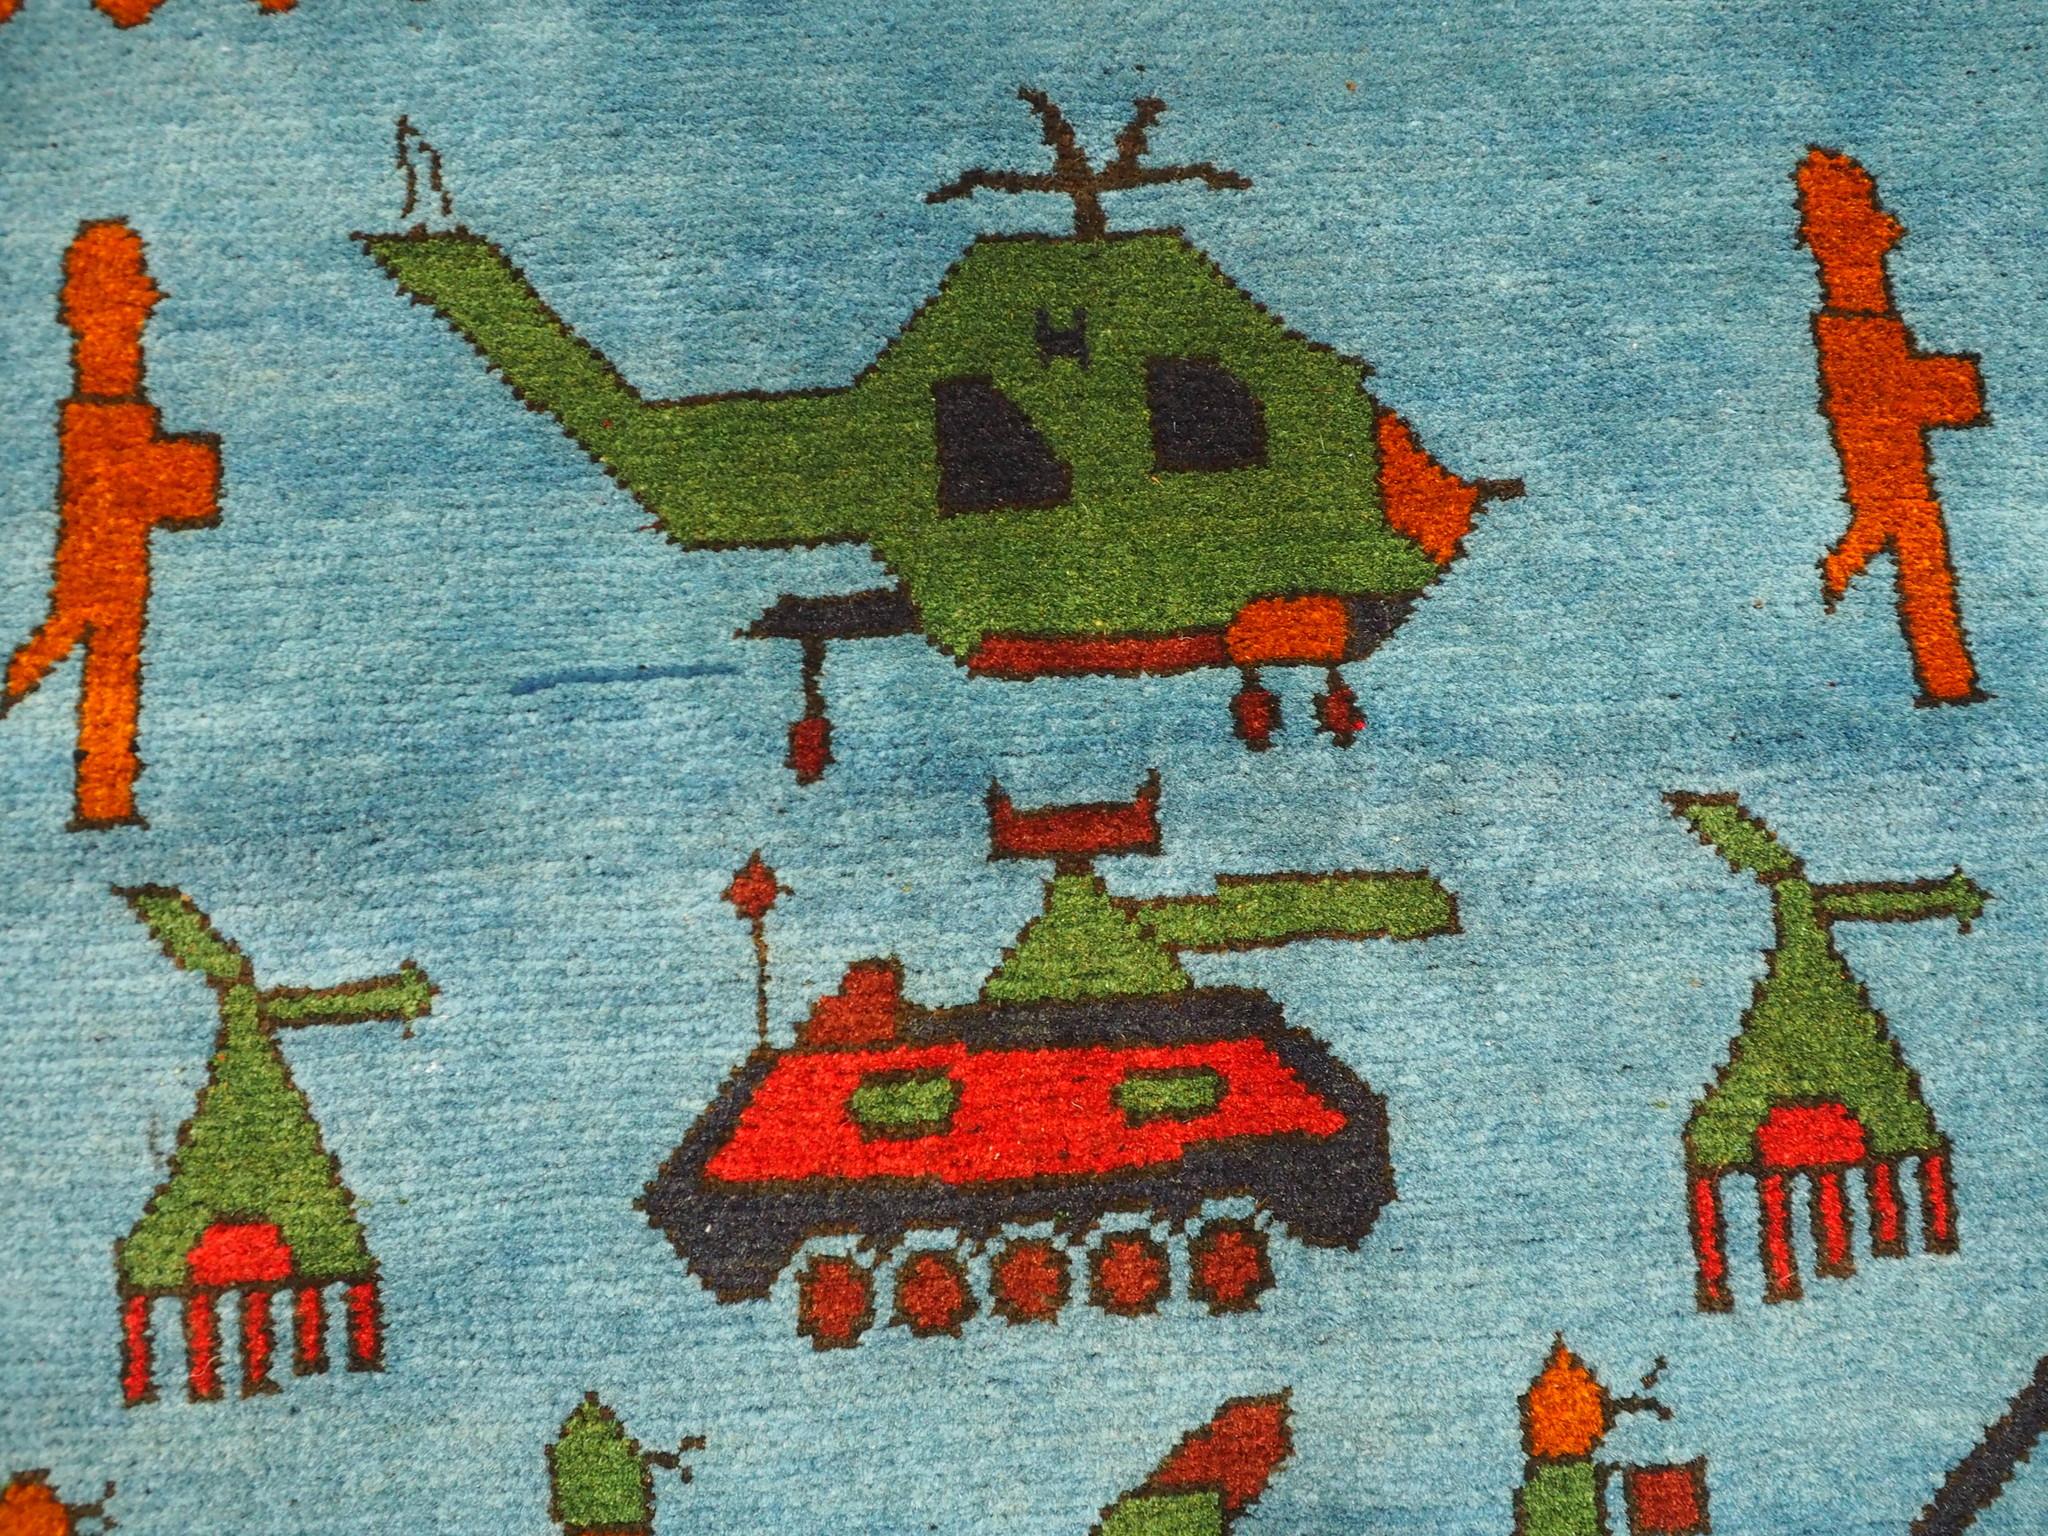 146x108 cm Afghan Kriegteppich Handgeknüpf Teppich Afghanistan panzer kampfjet gewehr USA Army Nato ISAF war rug Nr:AFG21E